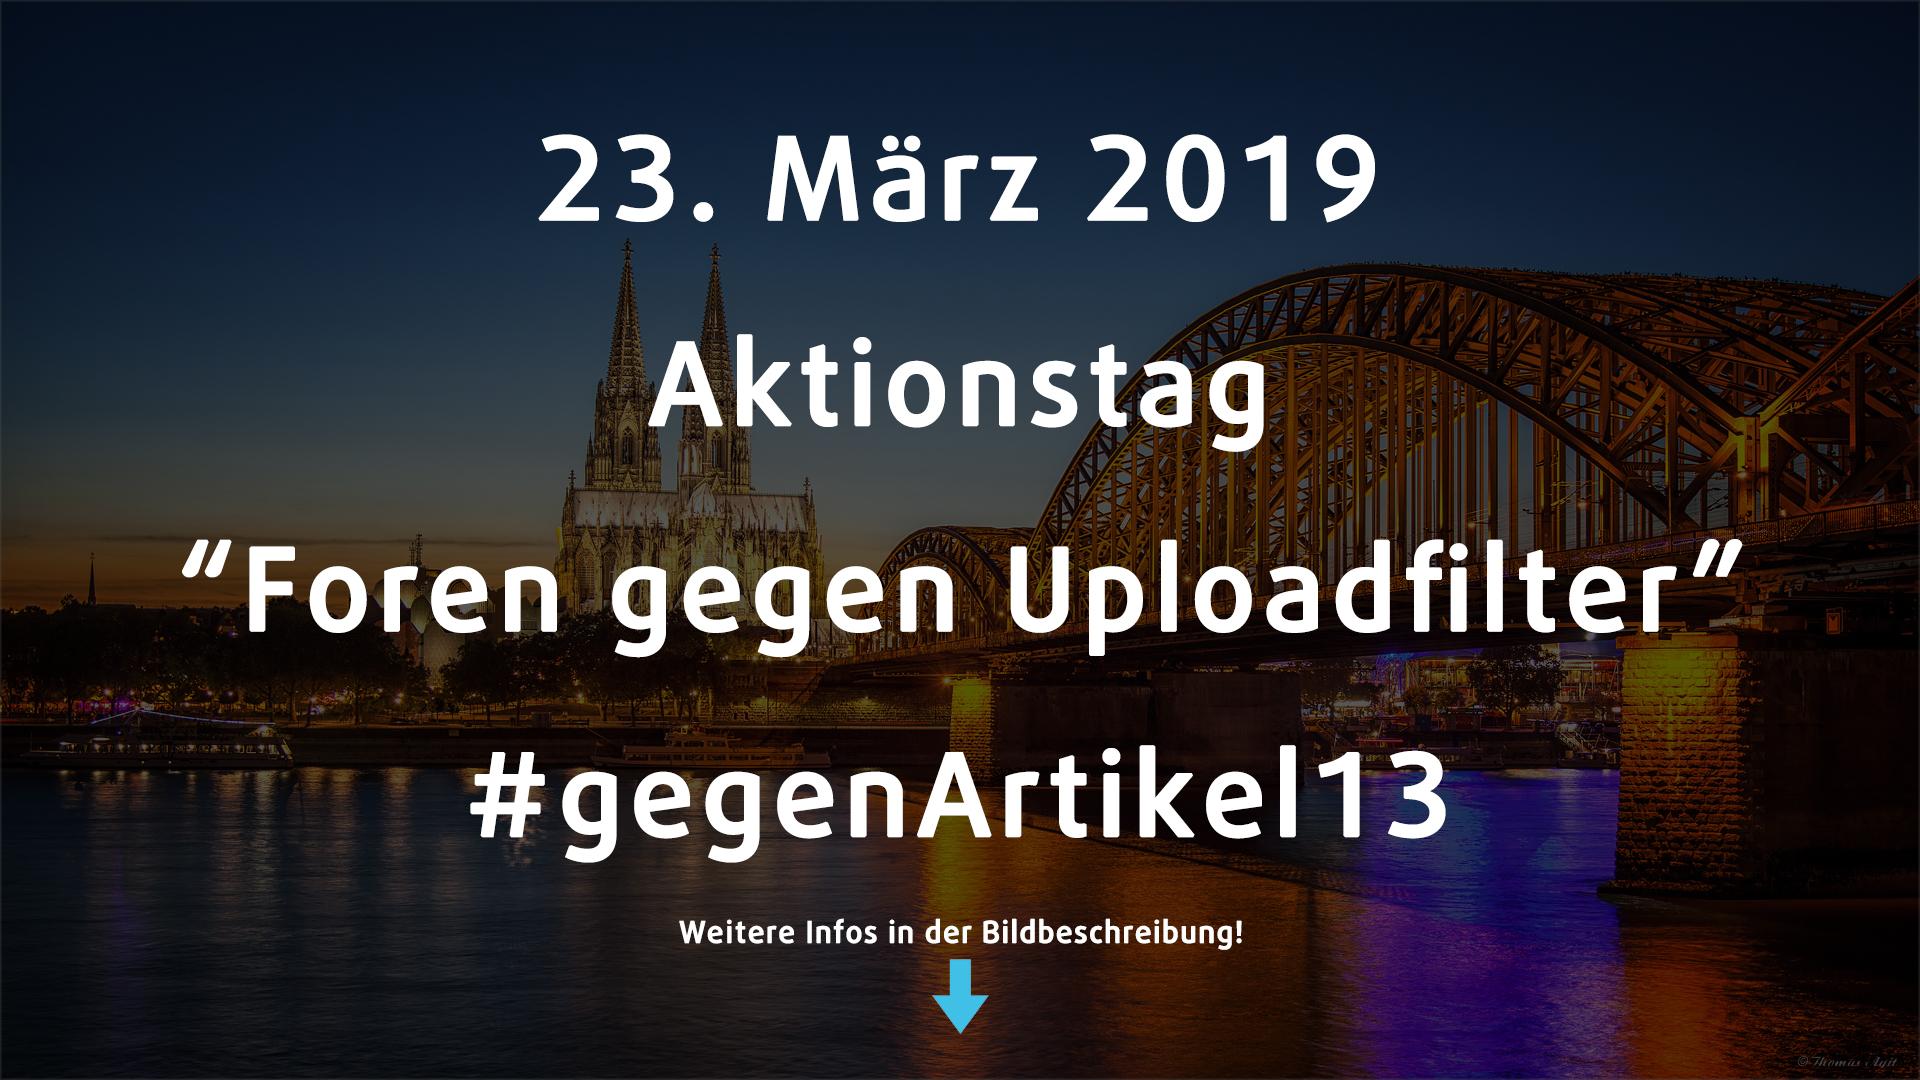 Aktionstag - #gegenArtikel13